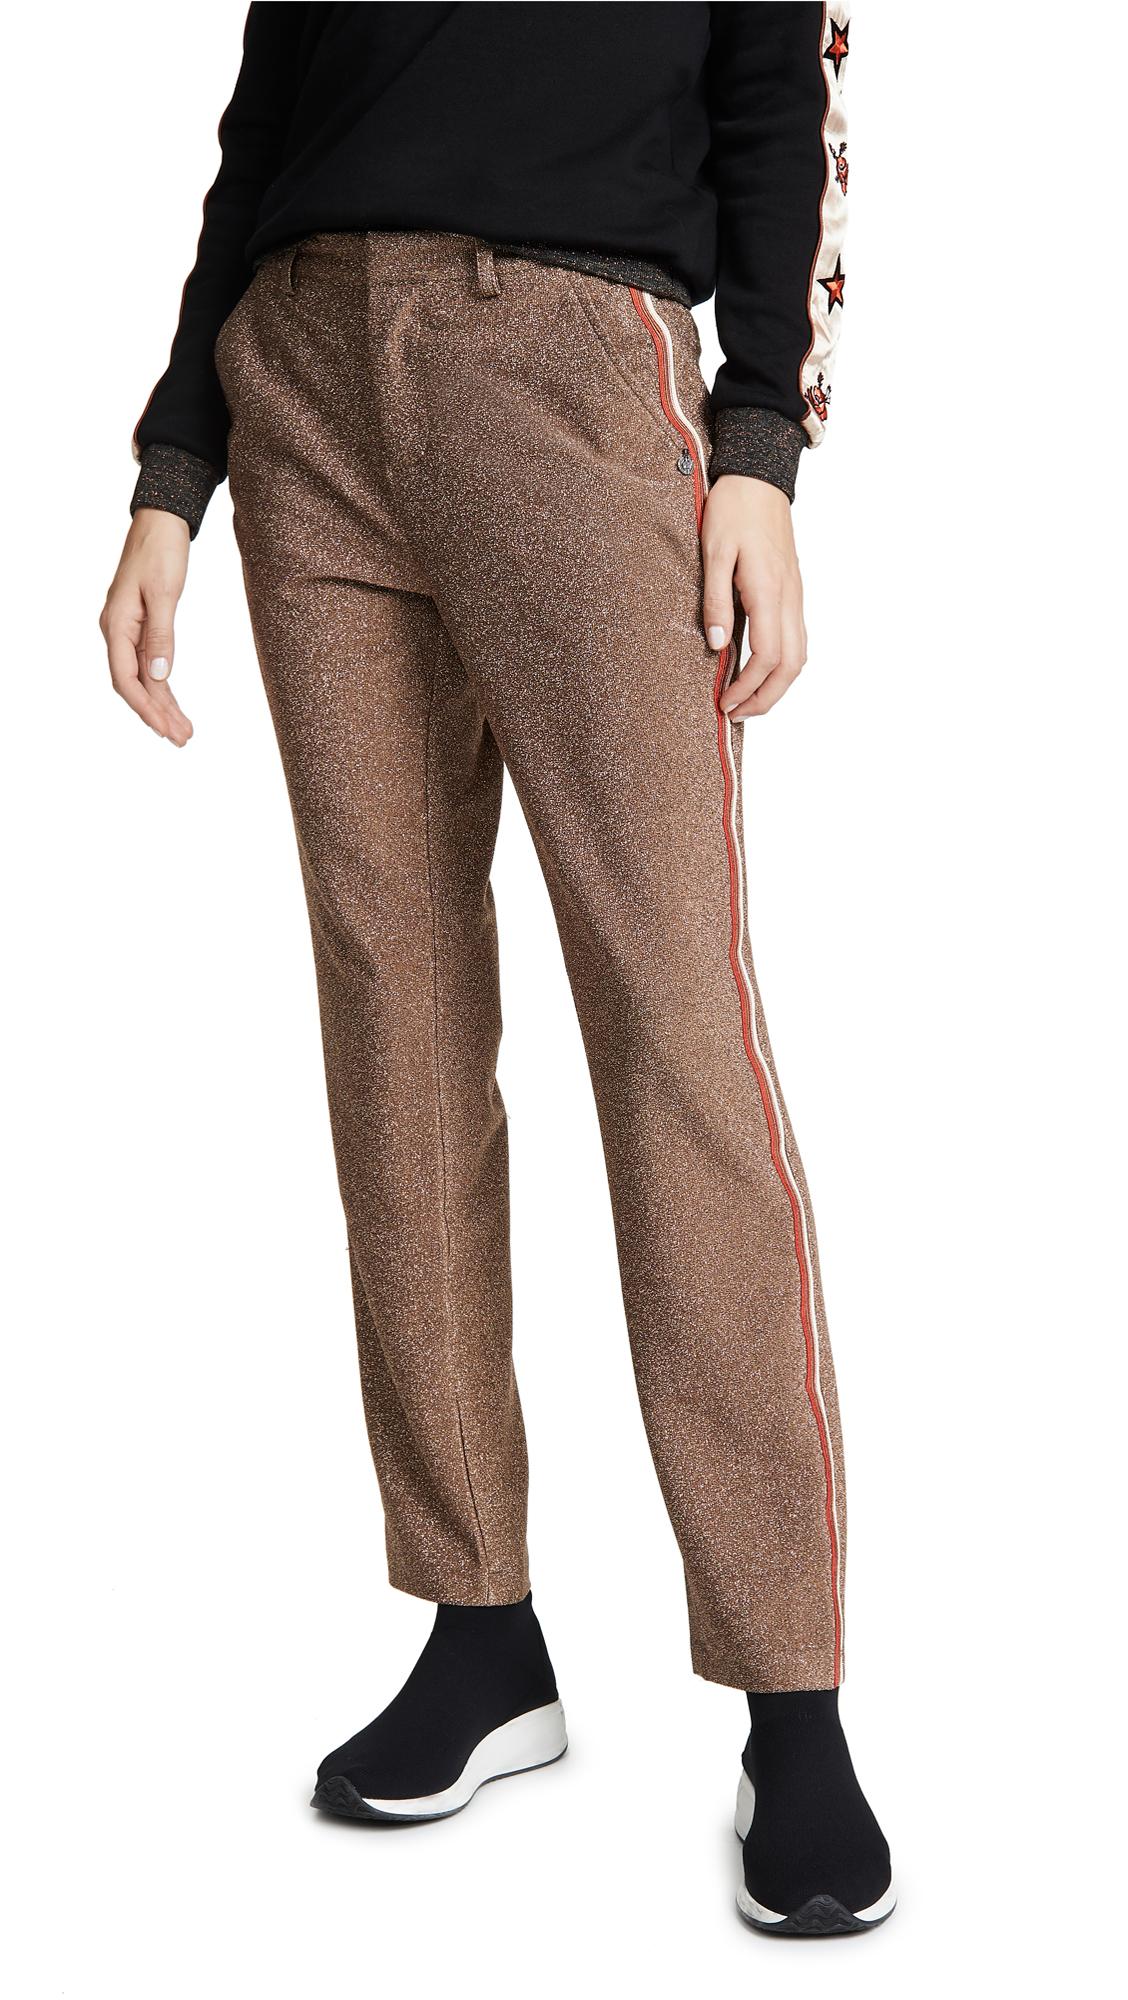 Scotch & Soda/Maison Scotch Metallic Tailored Pants In Combo A